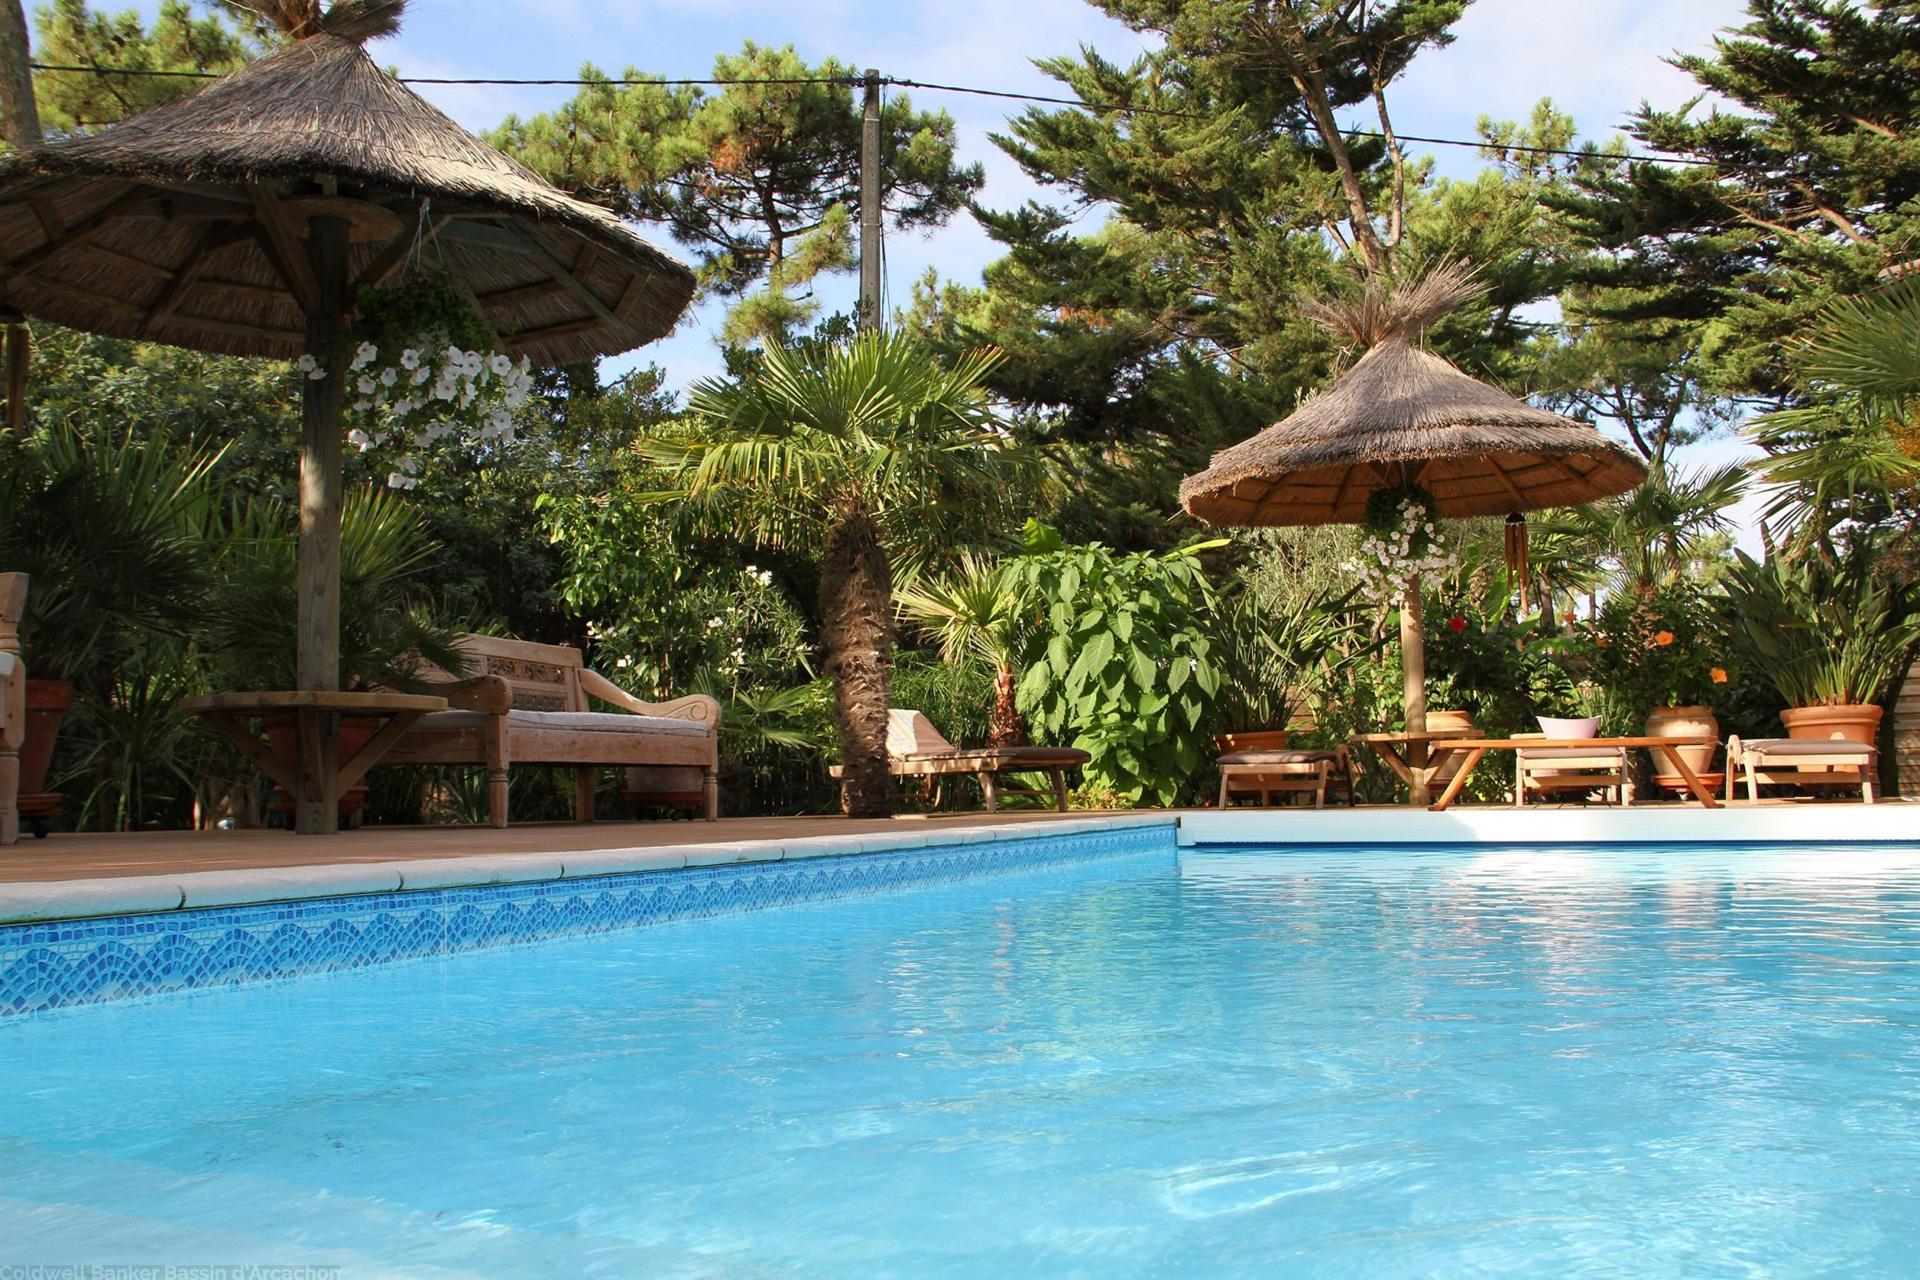 Vente villa cap ferret de luxe avec 4 chambres et piscine immobilier de luxe coldwell banker - Hotel luxe cap ferret ...